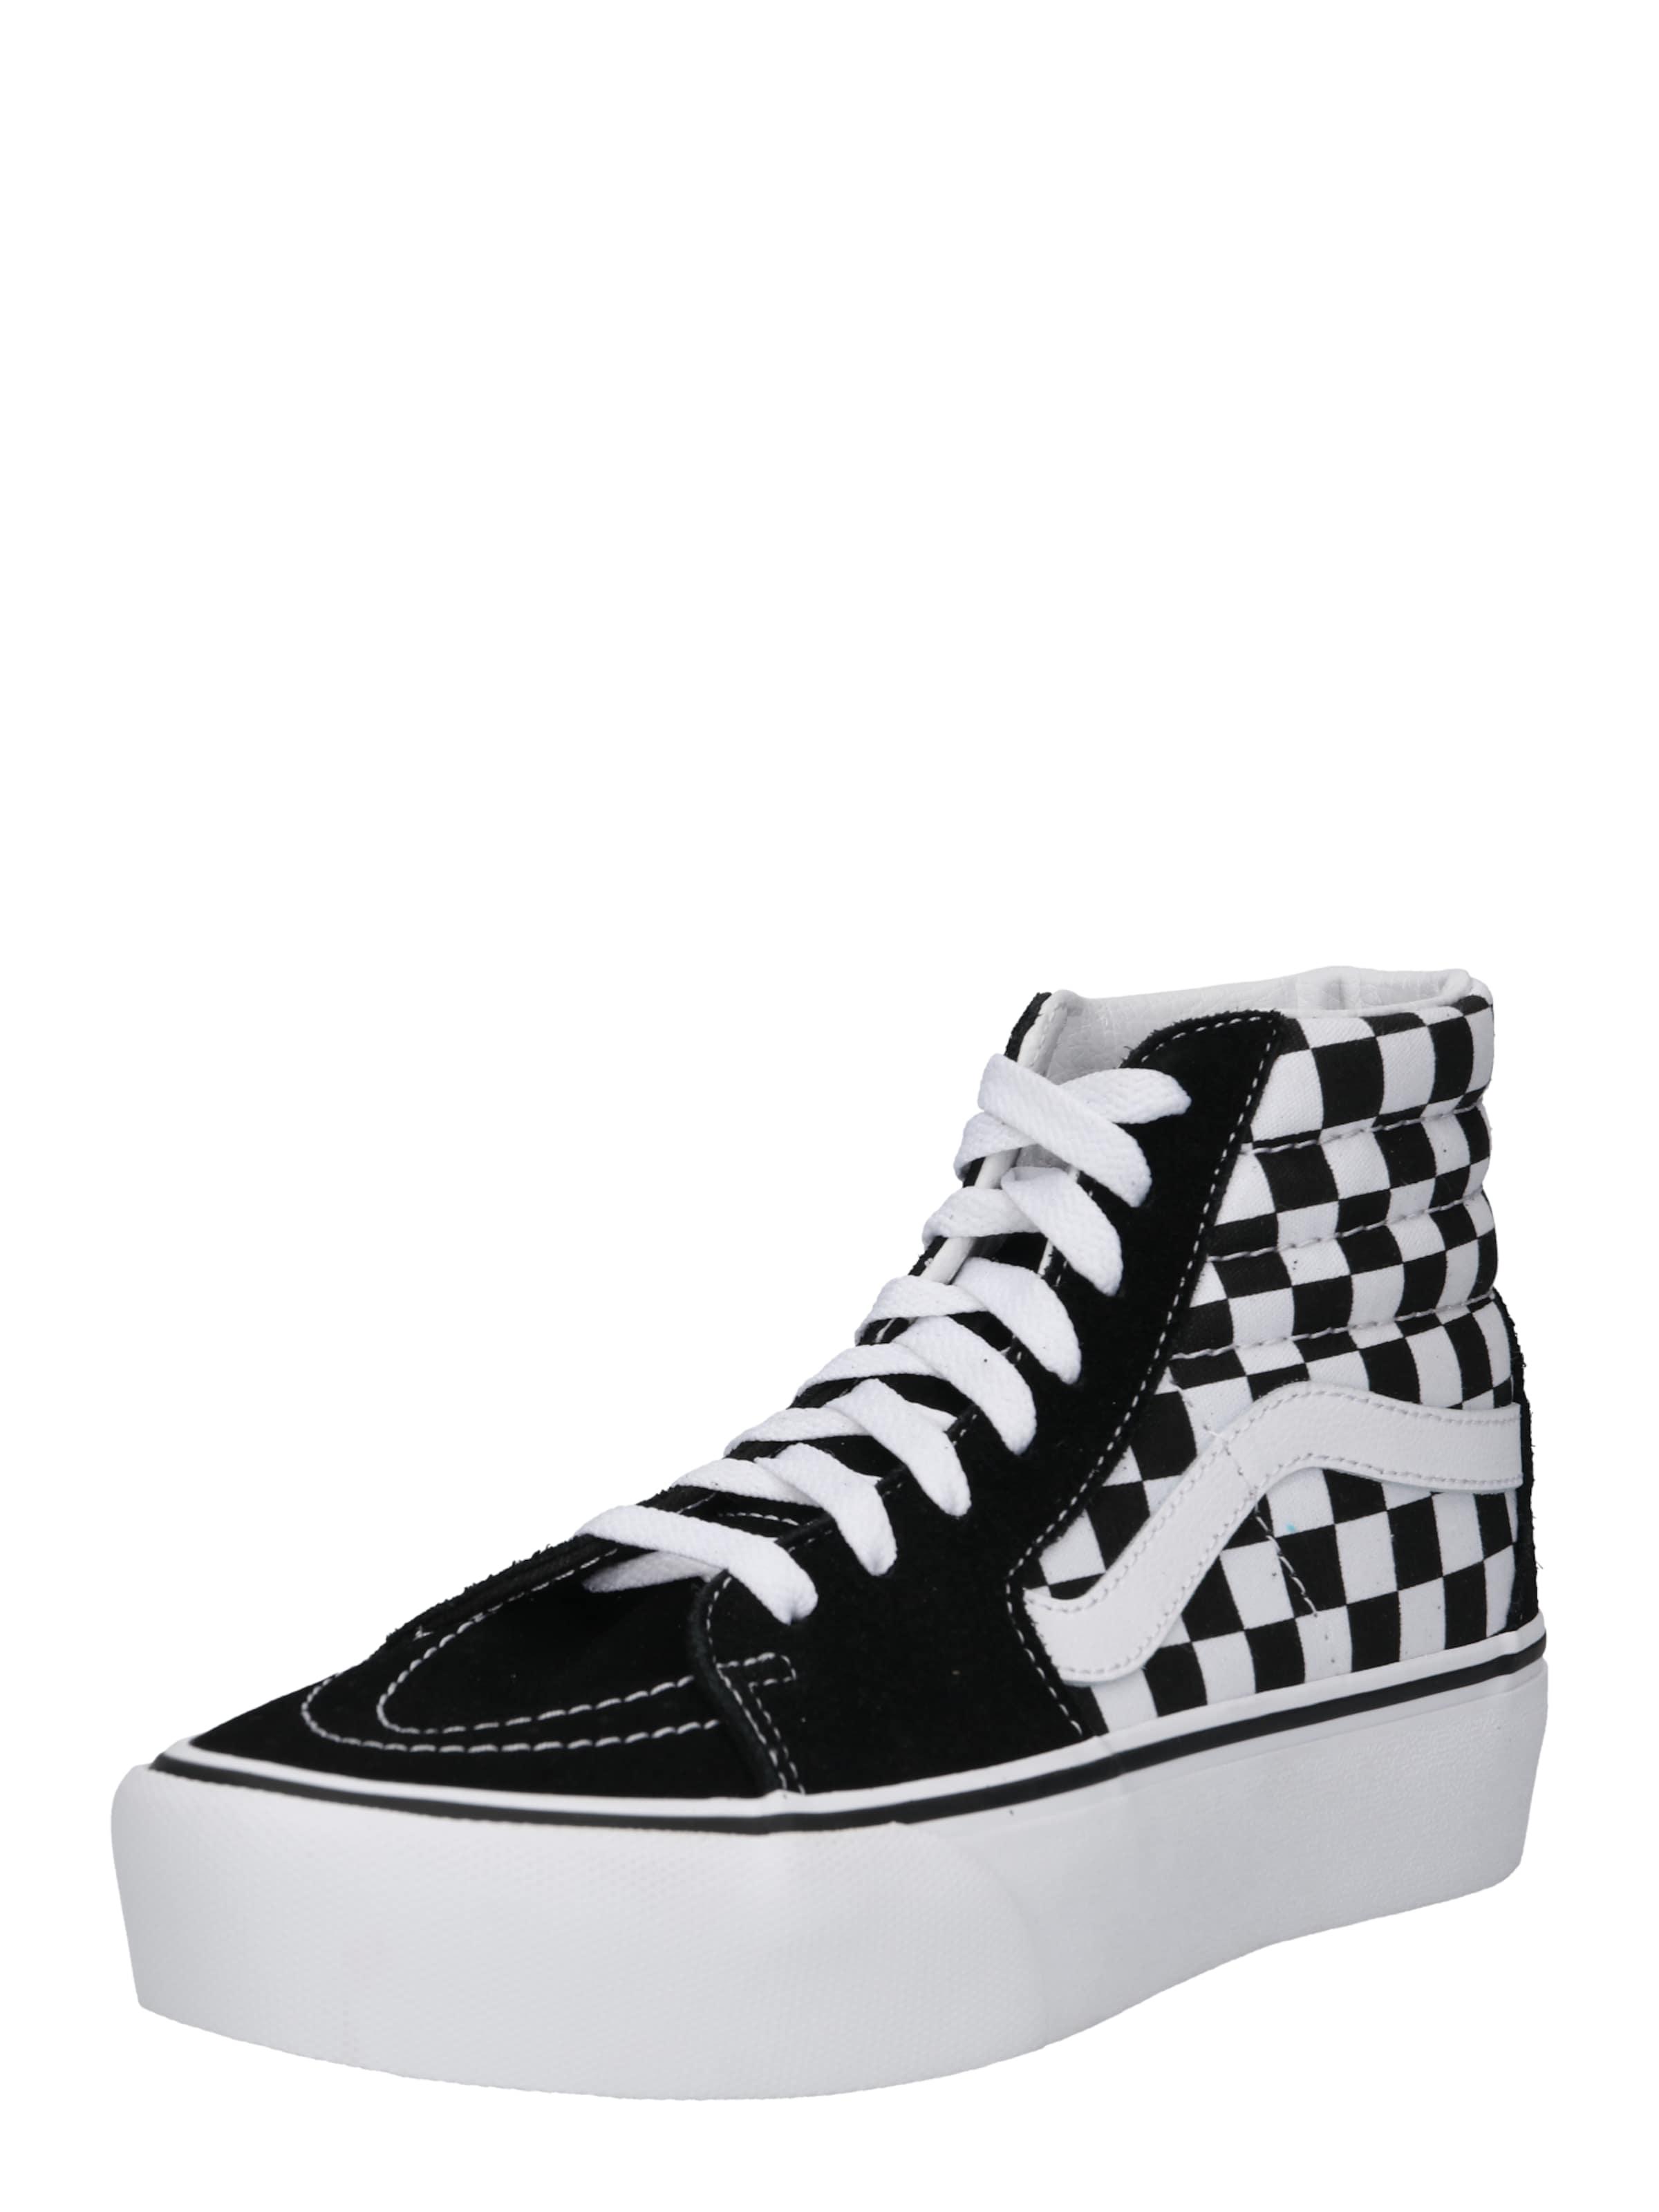 VANS Sneaker Günstige und langlebige Schuhe